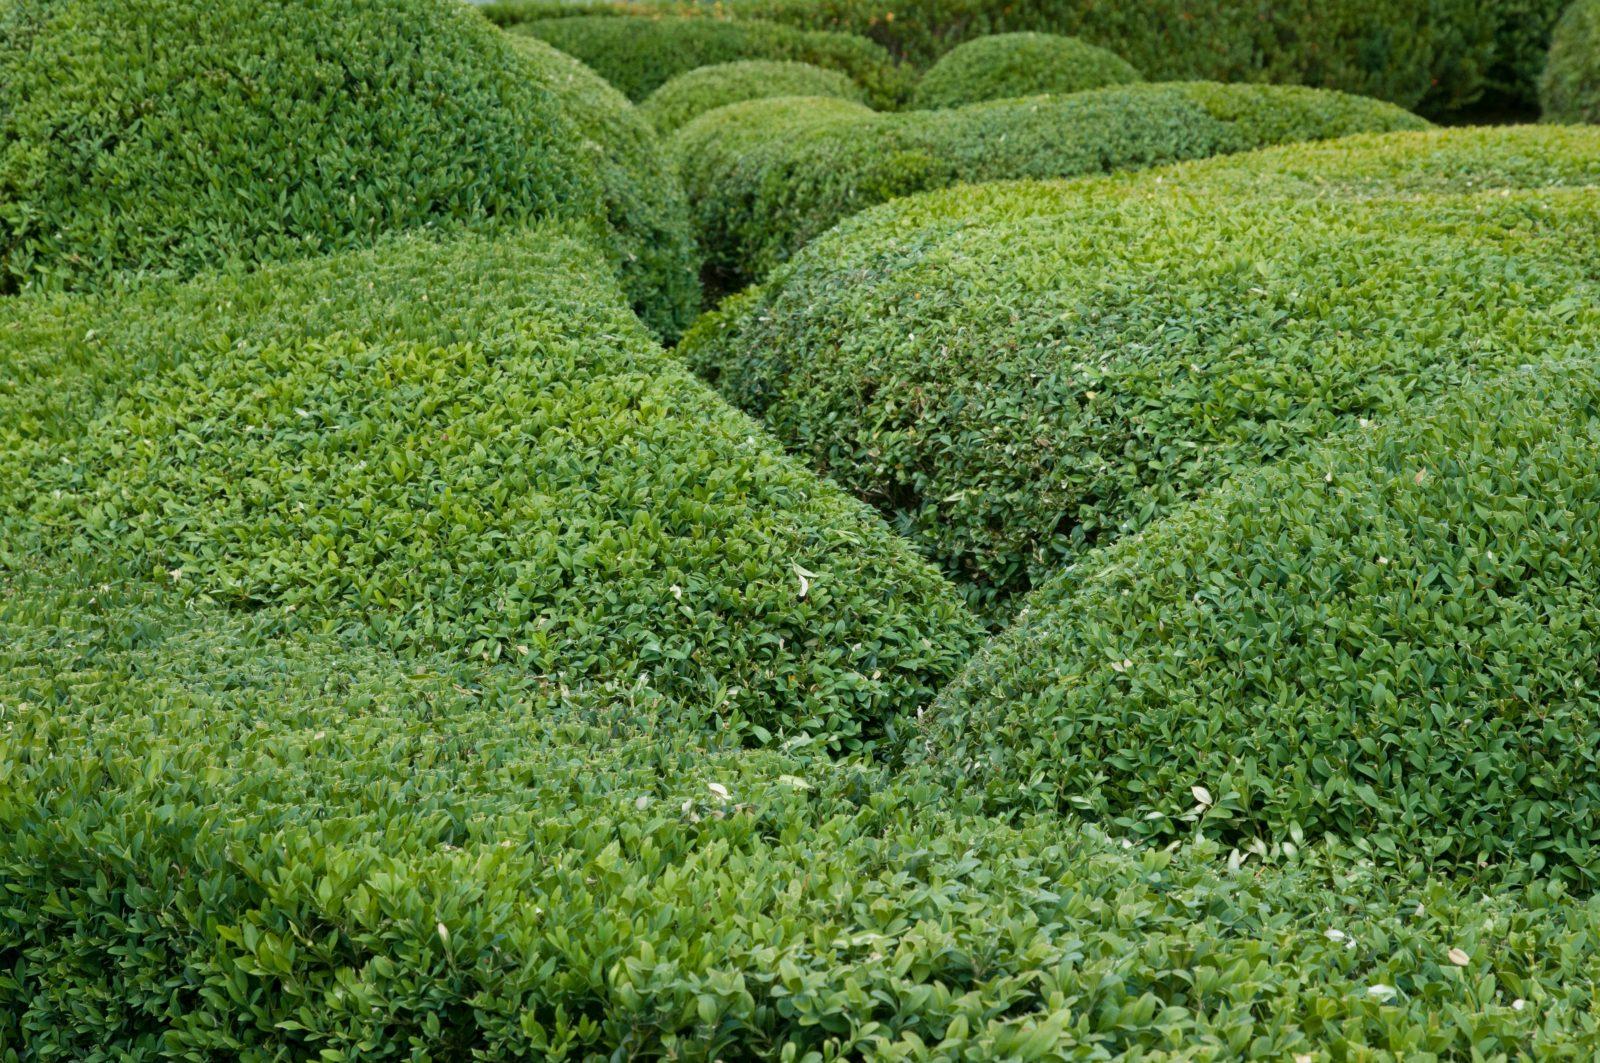 buxus garden round shapes texture